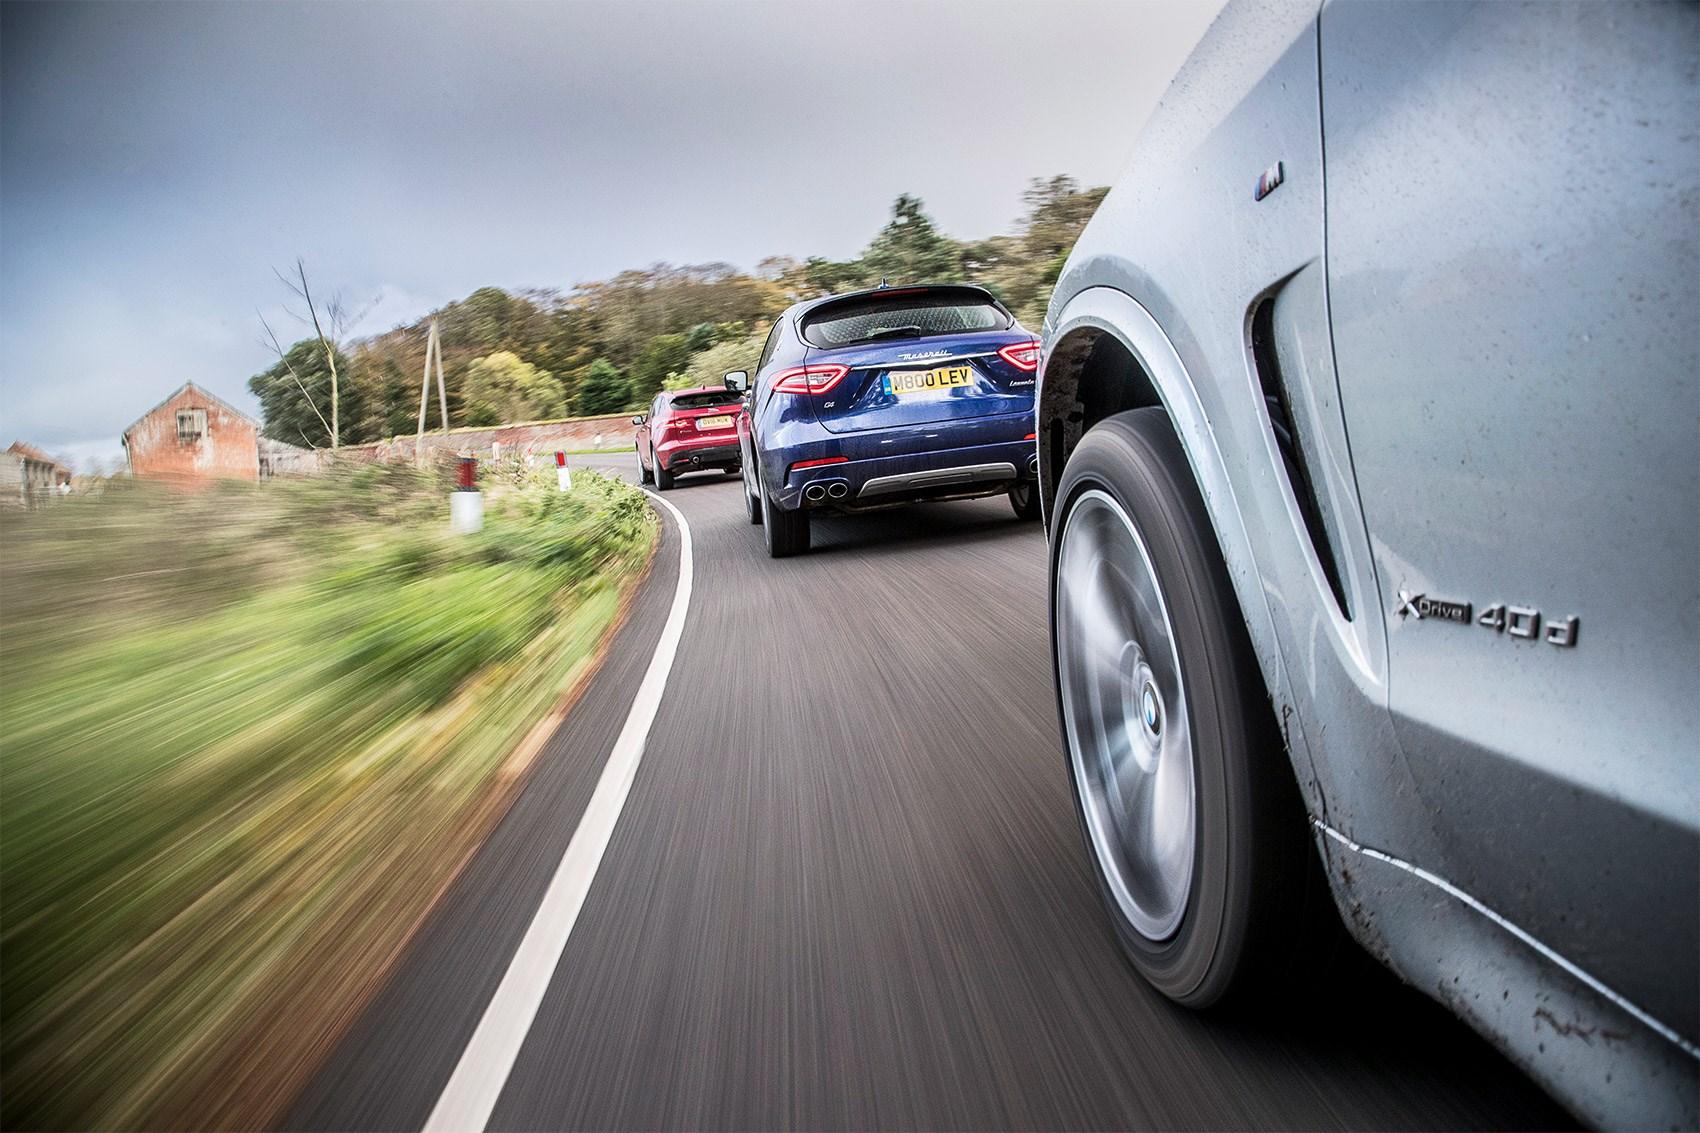 Maserati Levante Vs Jaguar F Pace Bmw X5 2017 Review Car Magazine Cetak Foto Ukuran 24r Salon Which Would You Pick